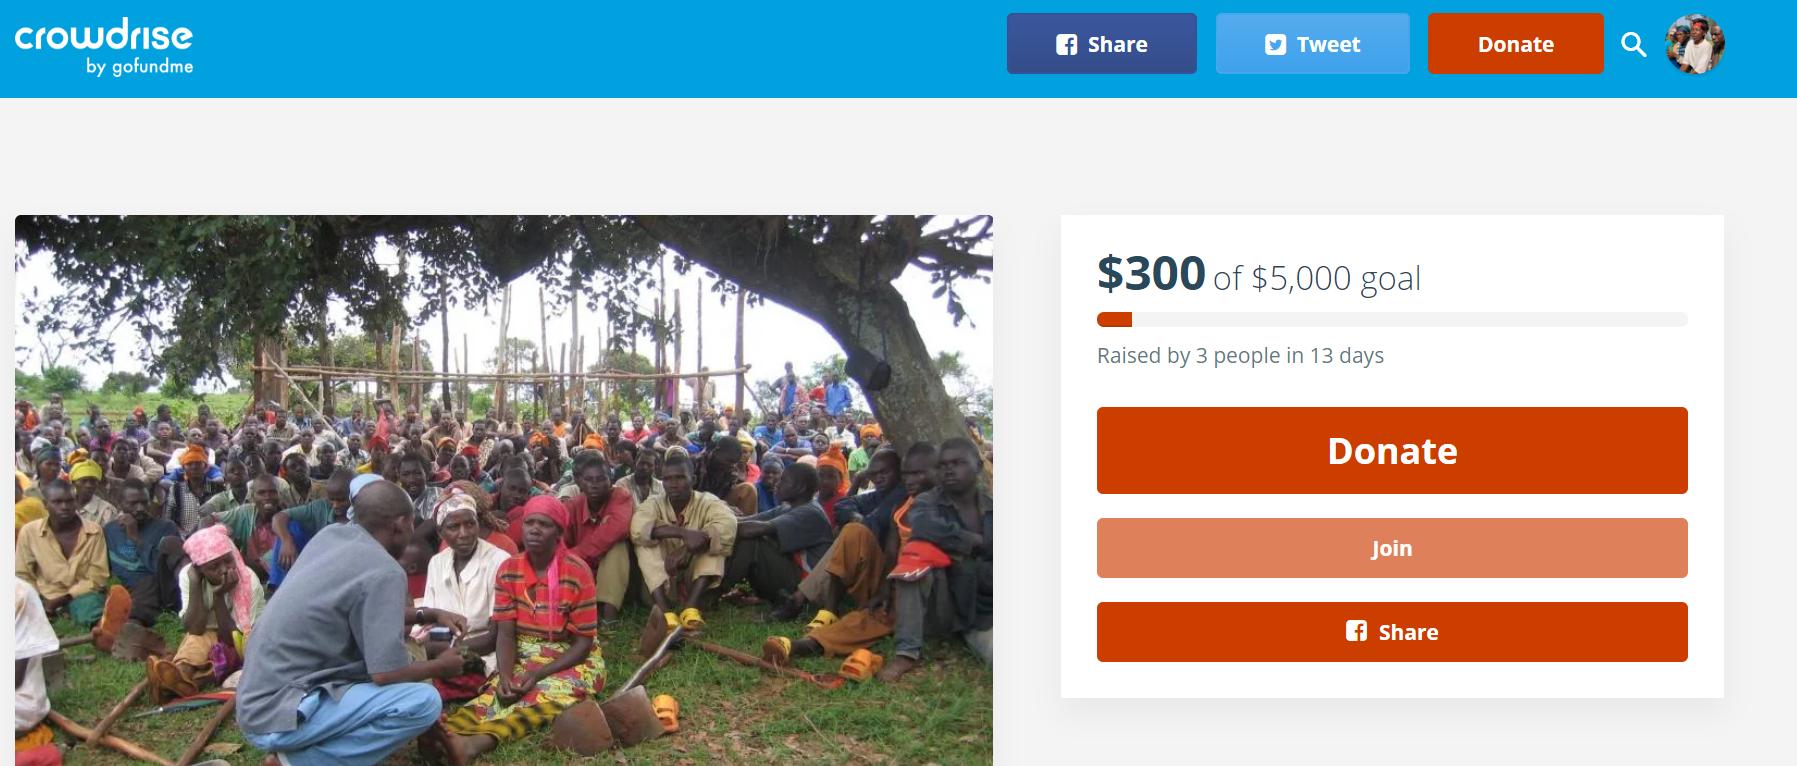 Launching A Crop-selling Venture In Mumeya